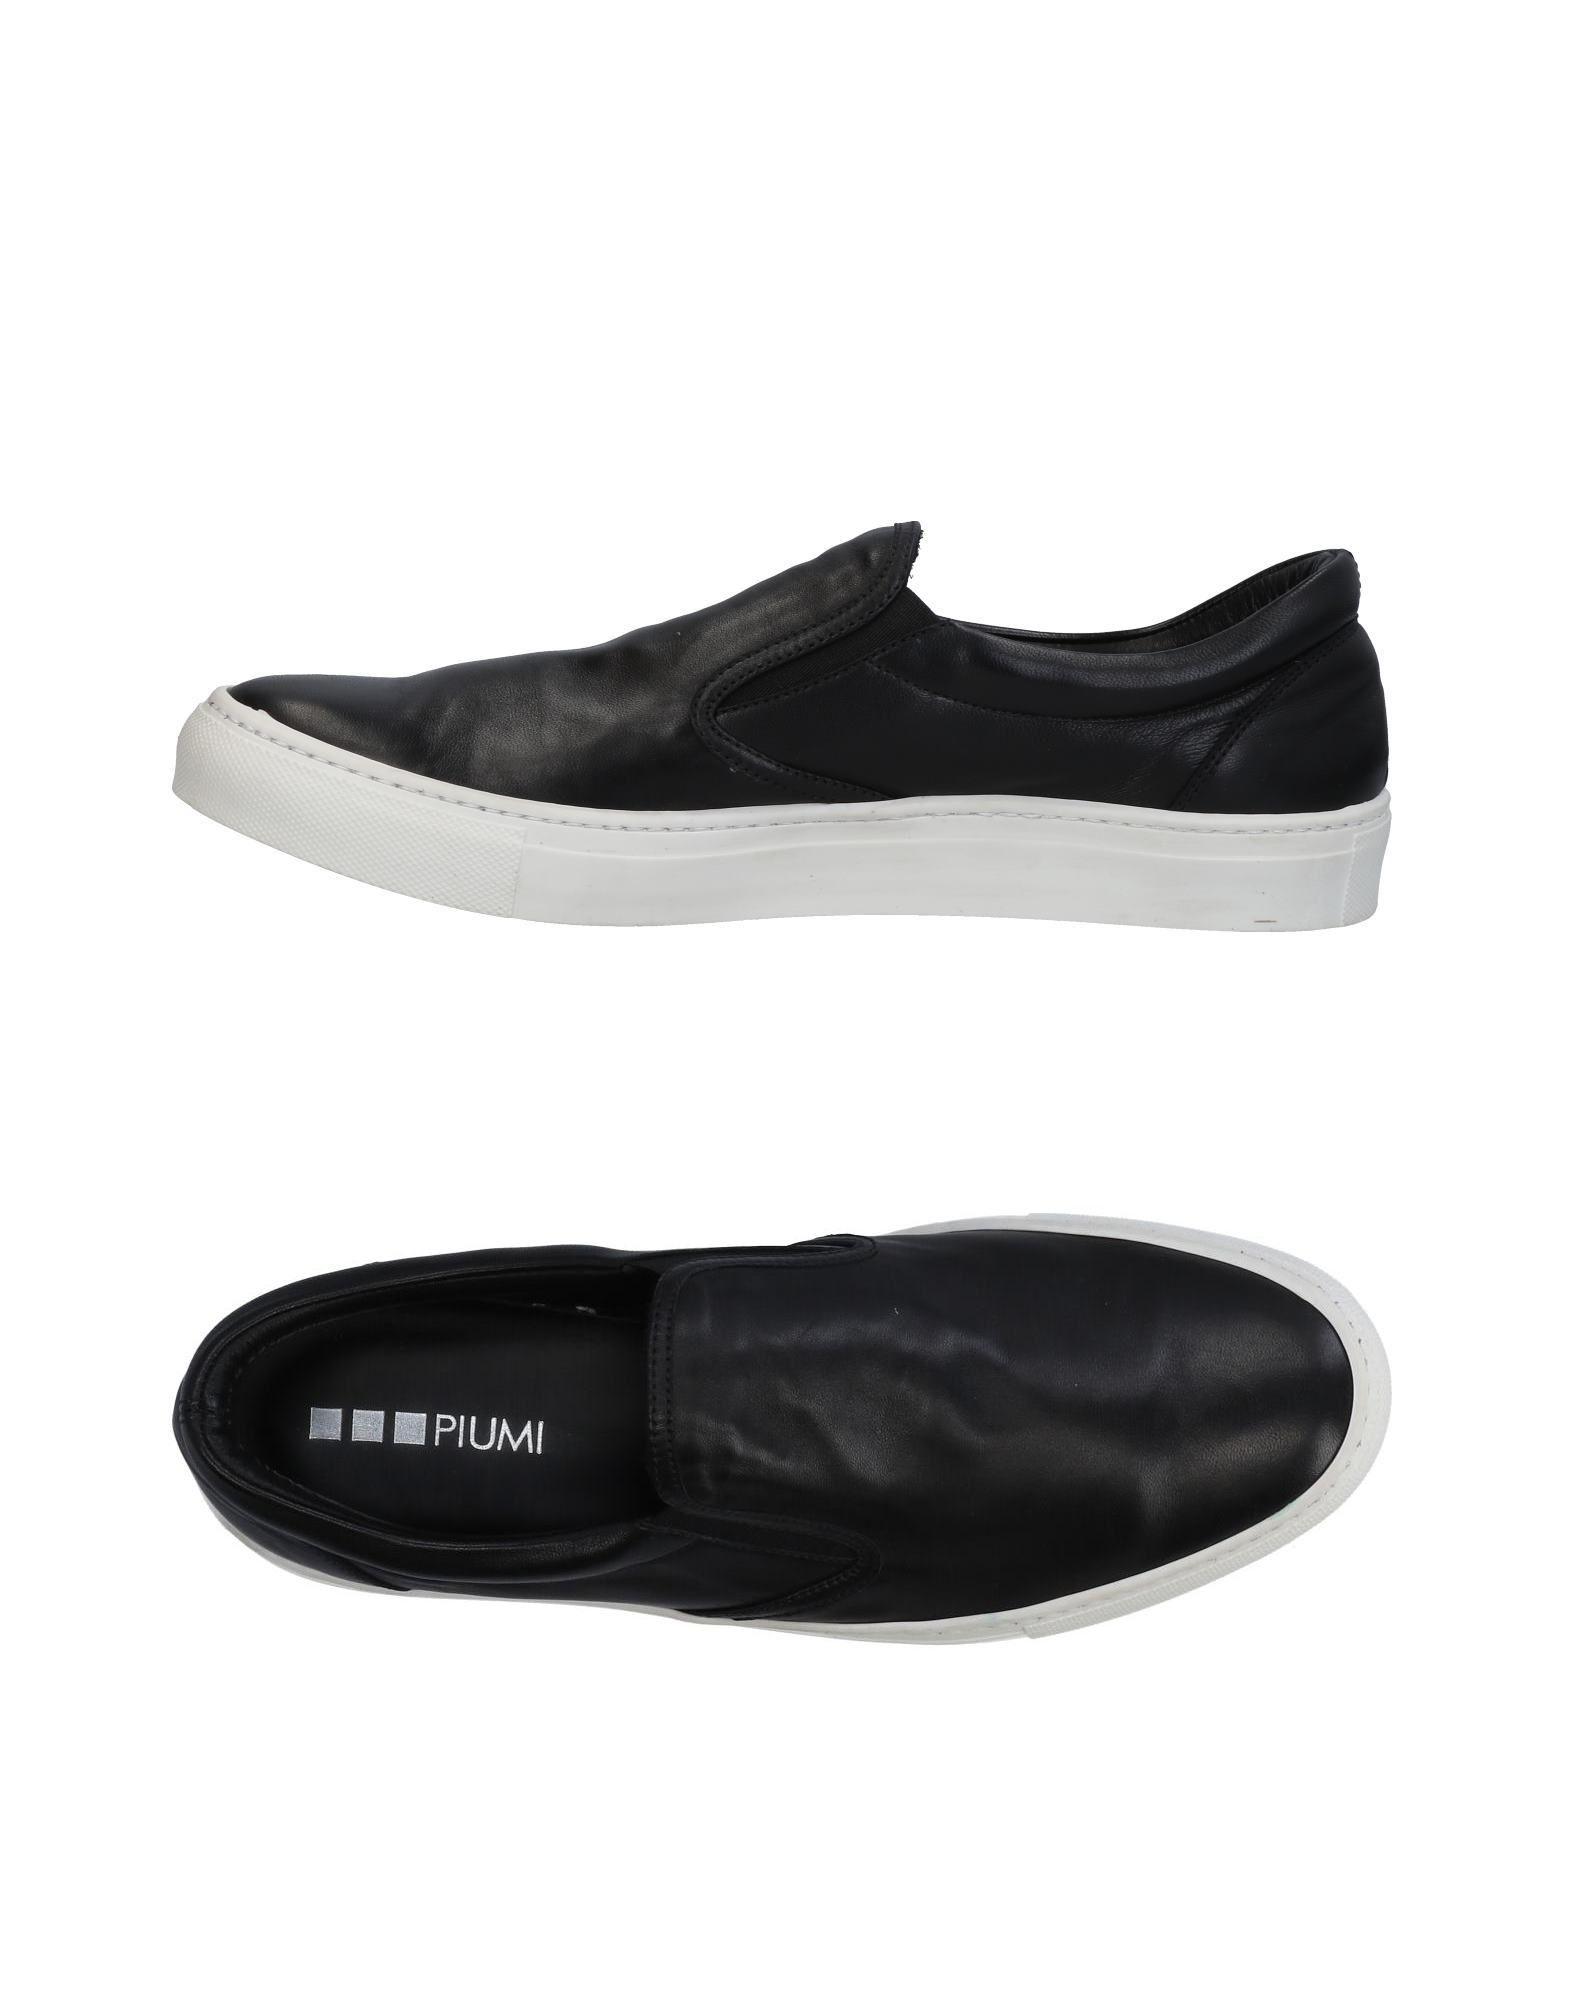 Rabatt echte Schuhe Piumi Sneakers Herren  11460367QE